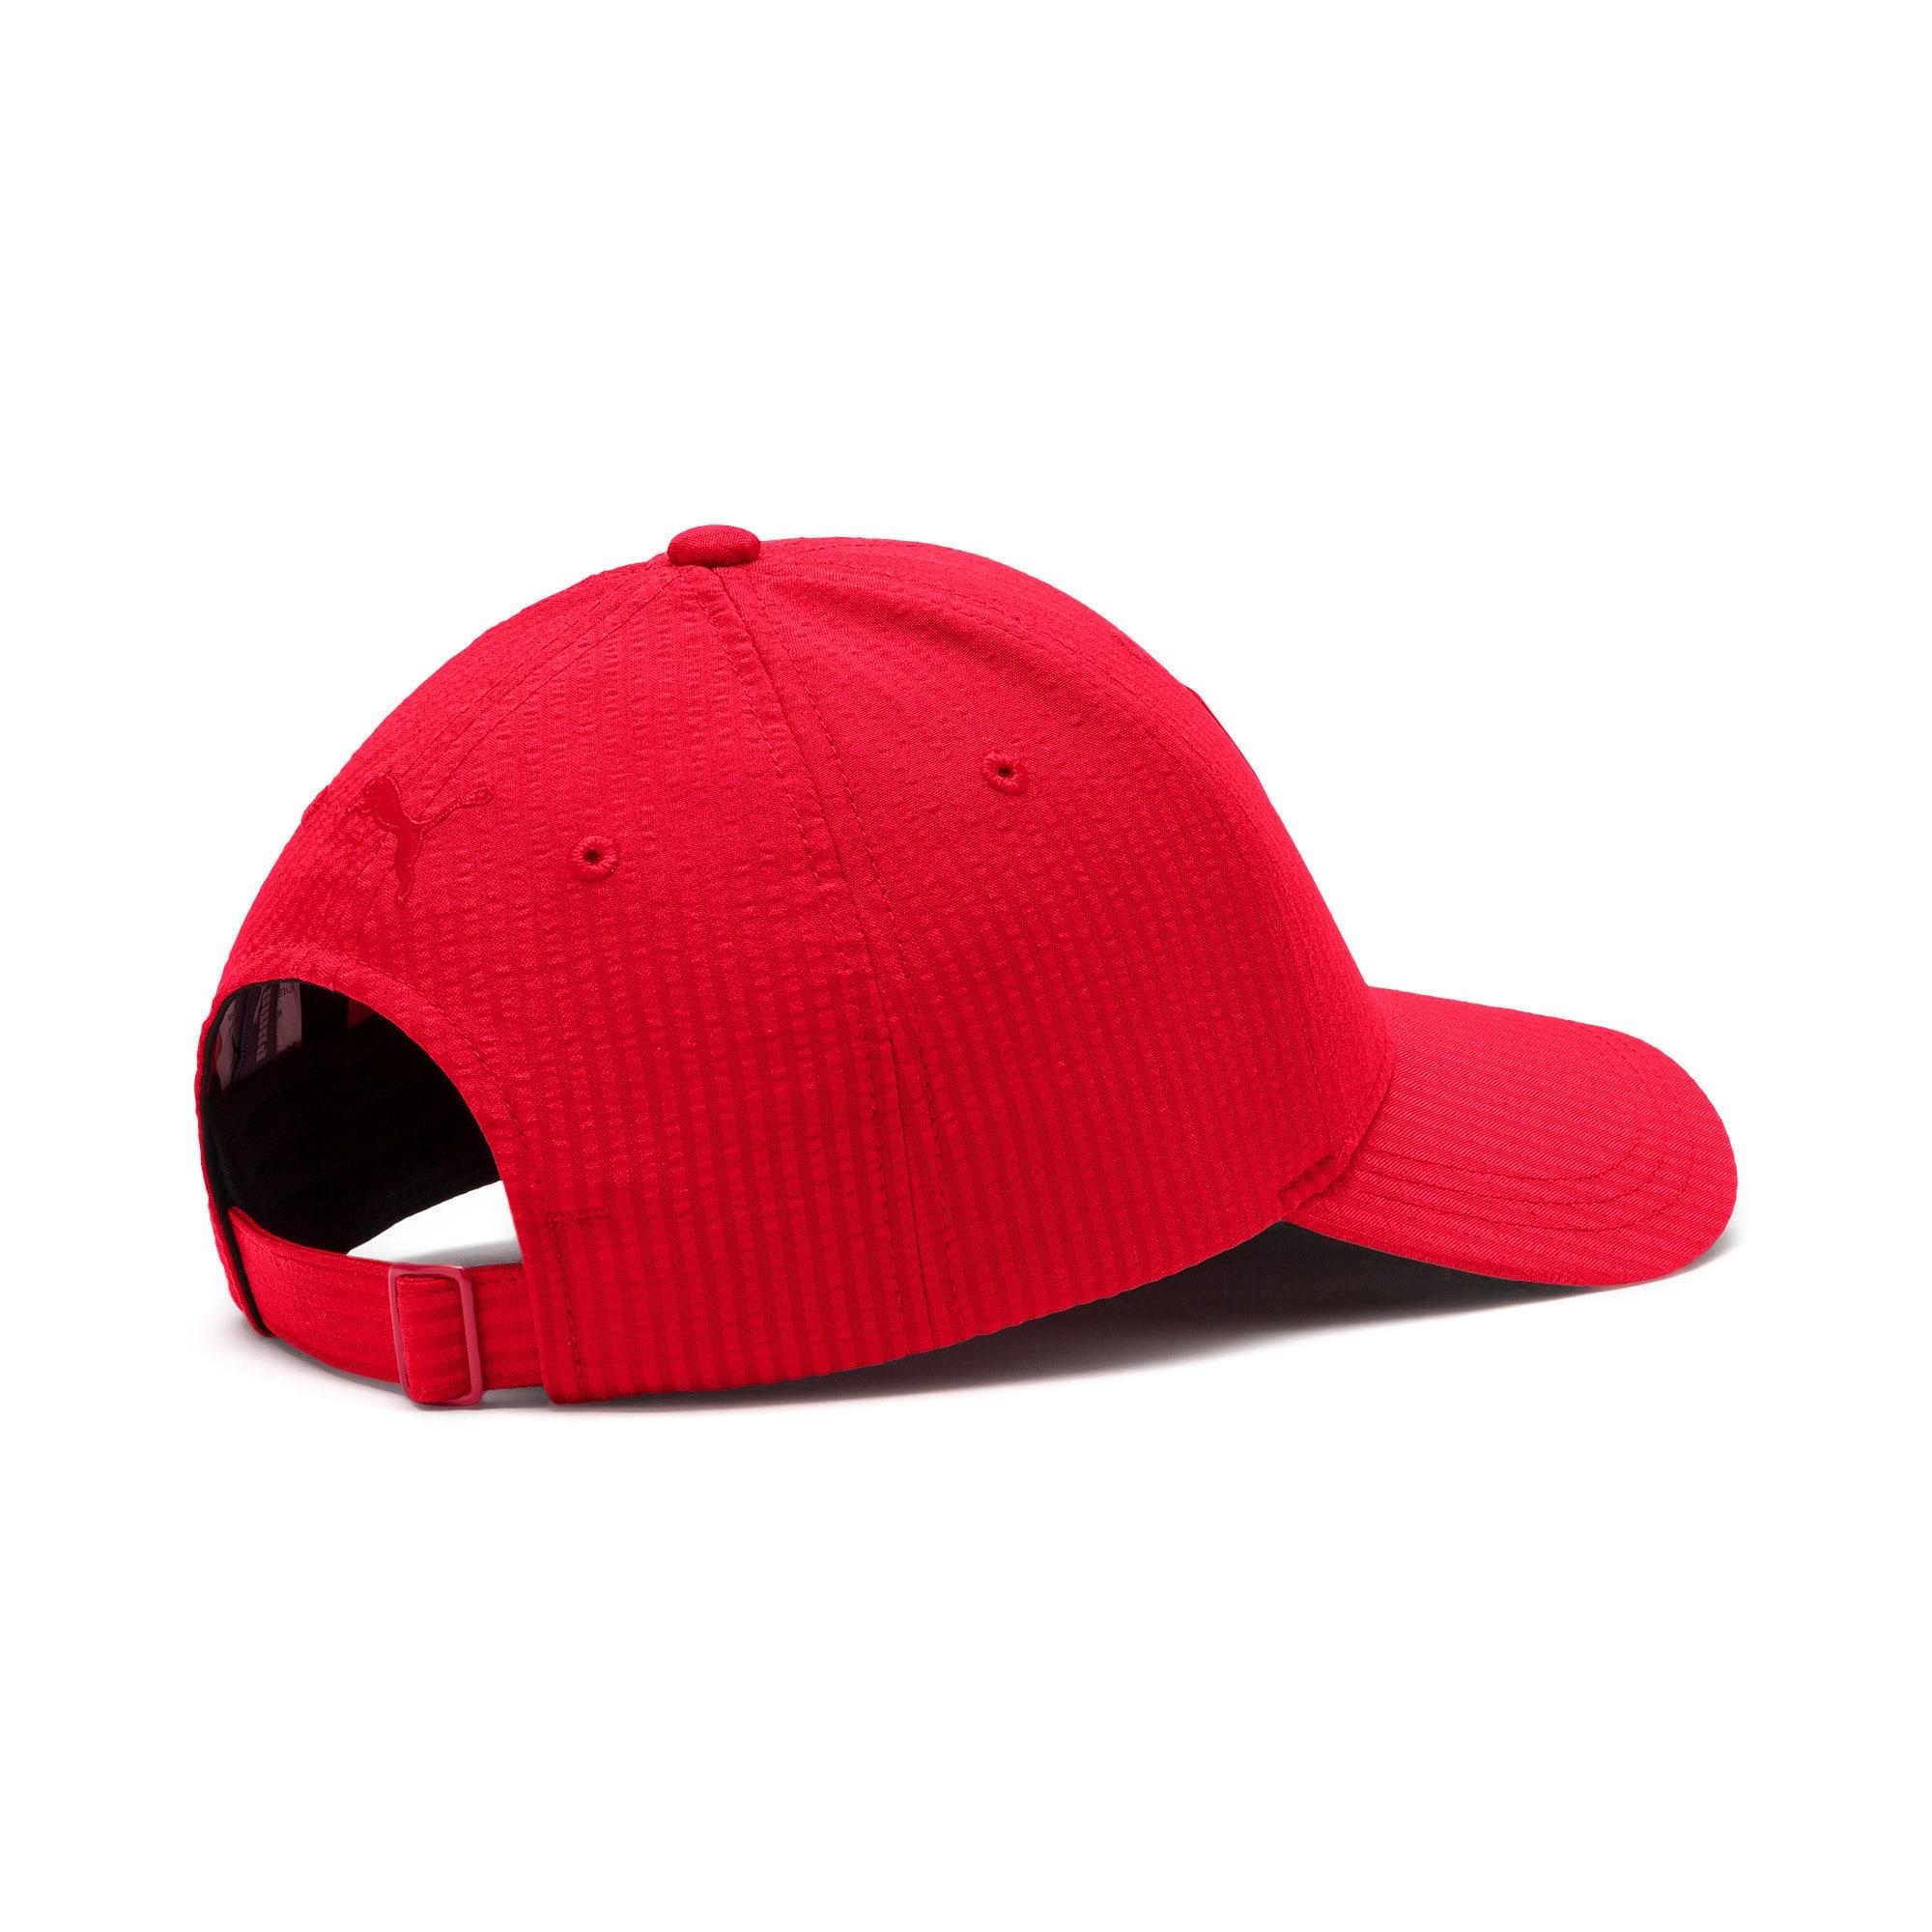 Thumbnail 3 of Ferrari Lifestyle Baseball Cap, Rosso Corsa, medium-IND